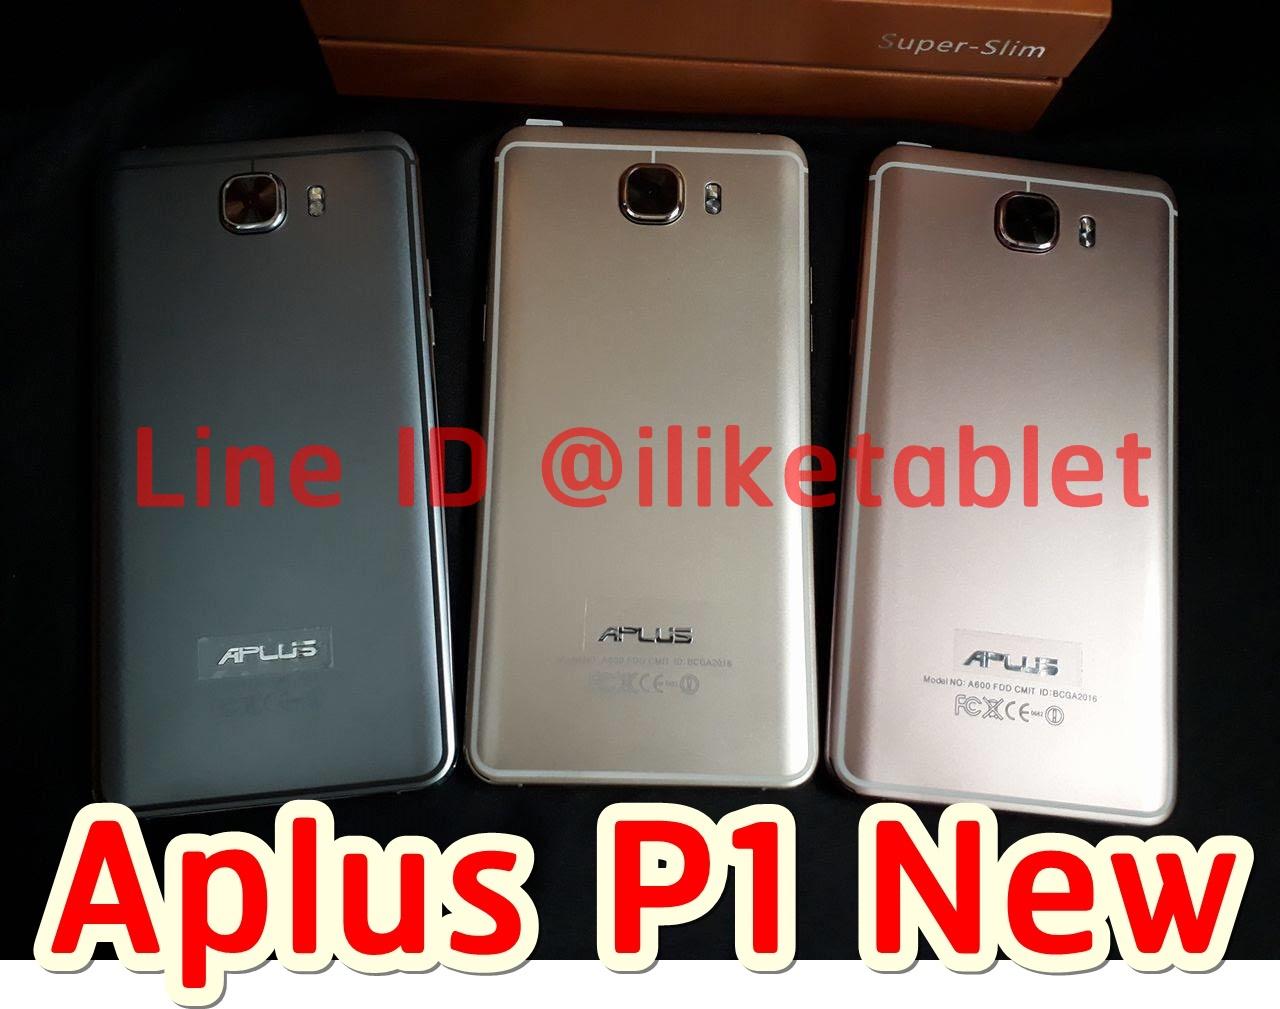 APLUS P1 New 4 core จอใหญ่ 6 นิ้ว กล้อง 8 ล้าน 2 ซิม กล้องชัด